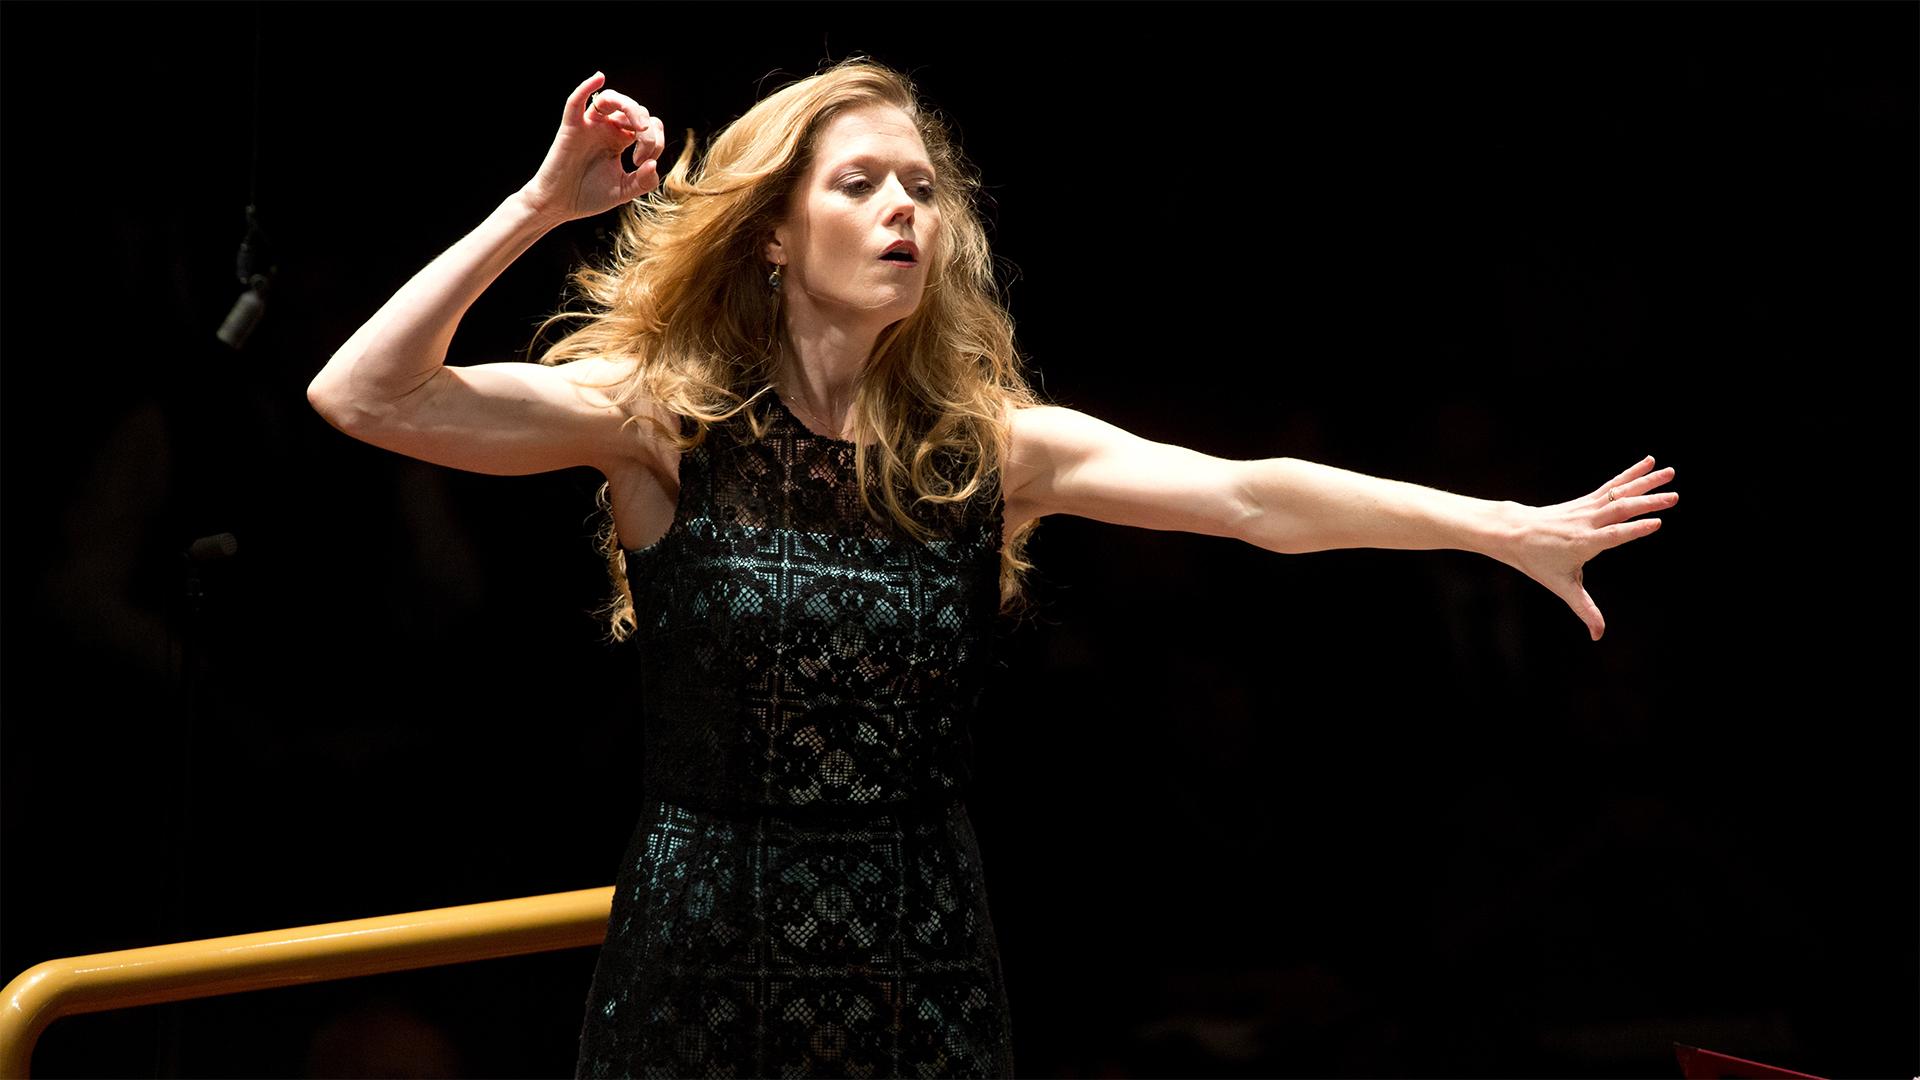 P2 Koncerten: Torsdagskoncert med Hannigan & Mozart